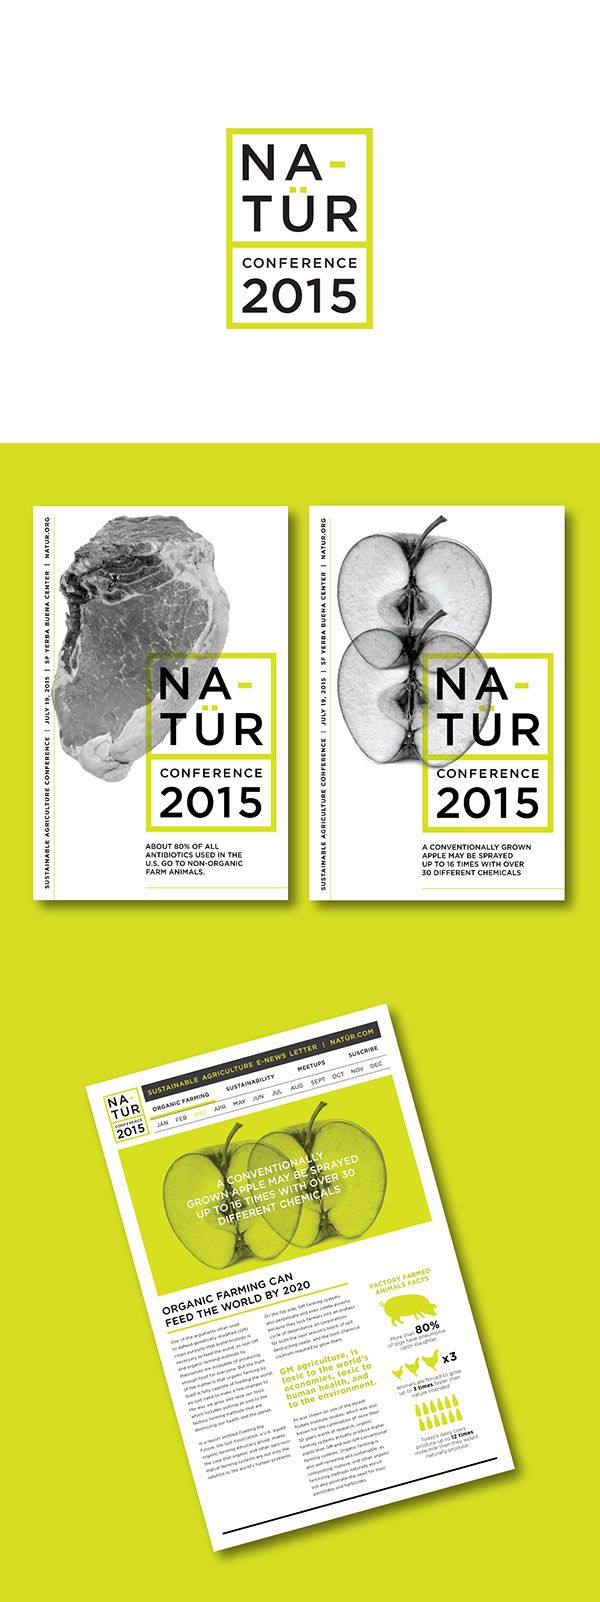 https://www.behance.net/gallery/22284277/Natur-Conference